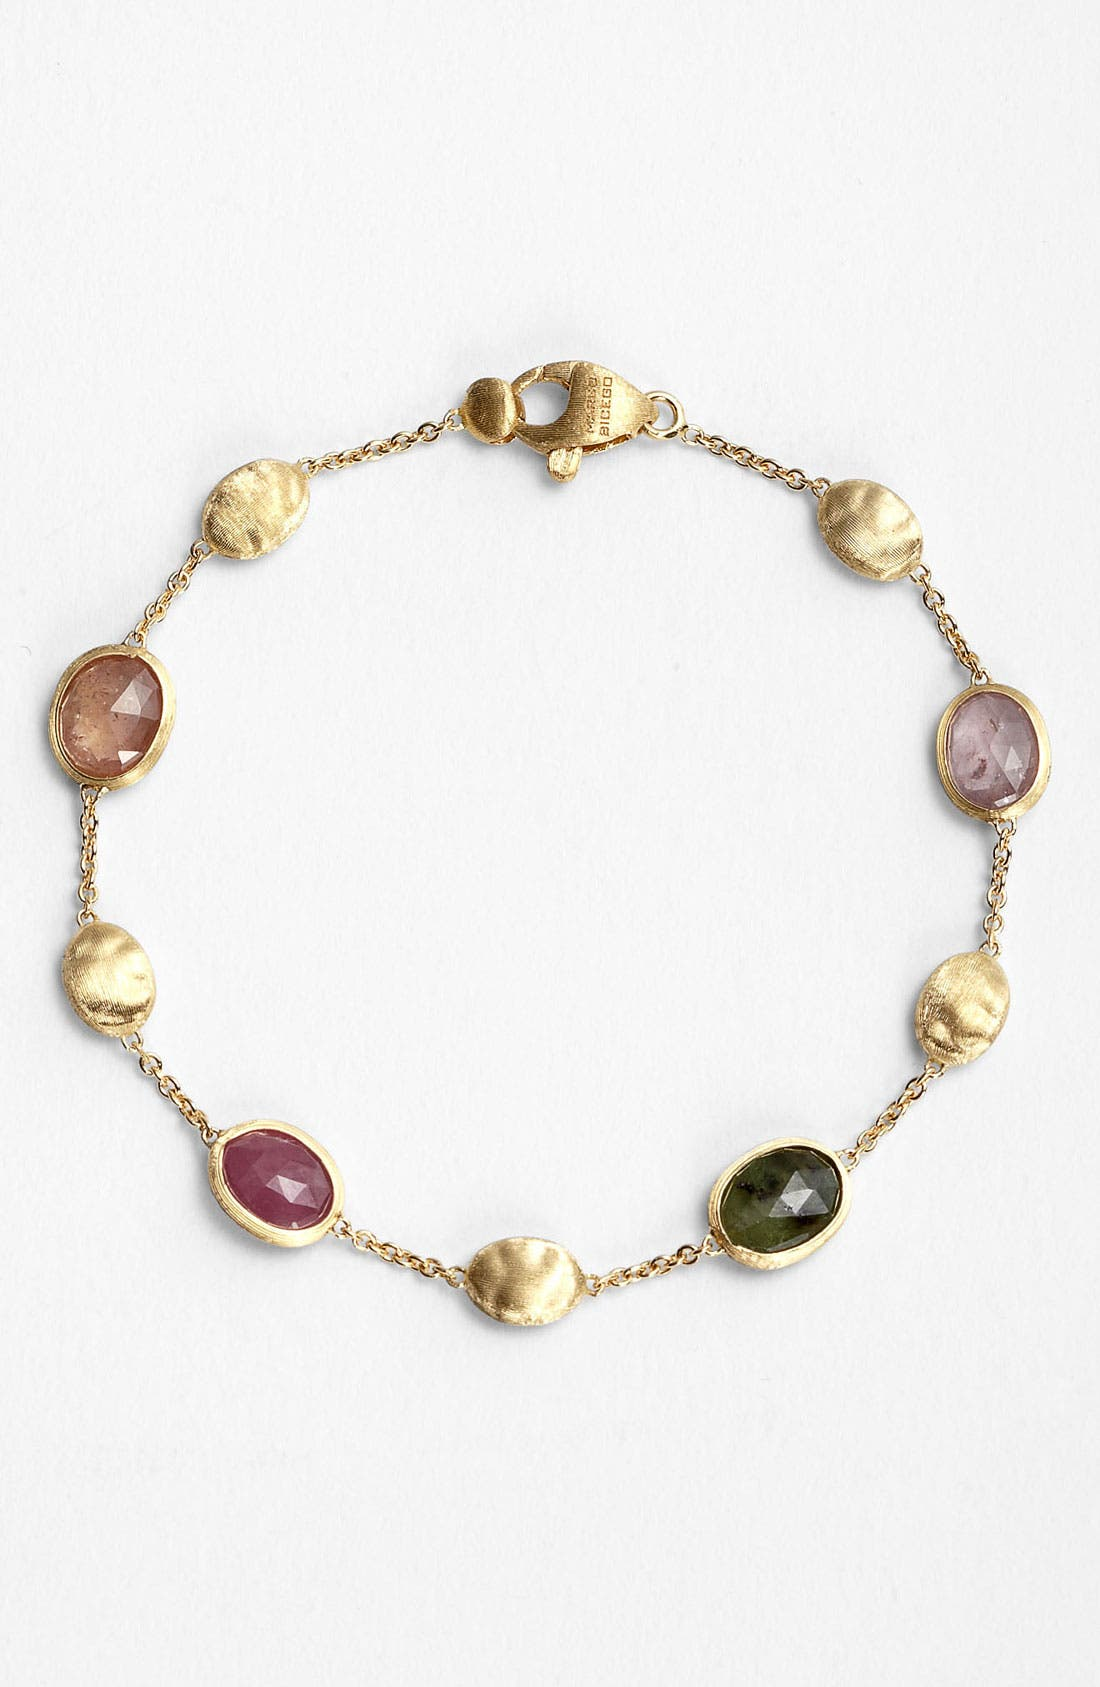 Alternate Image 1 Selected - Marco Bicego 'Siviglia' Sapphire Station Bracelet